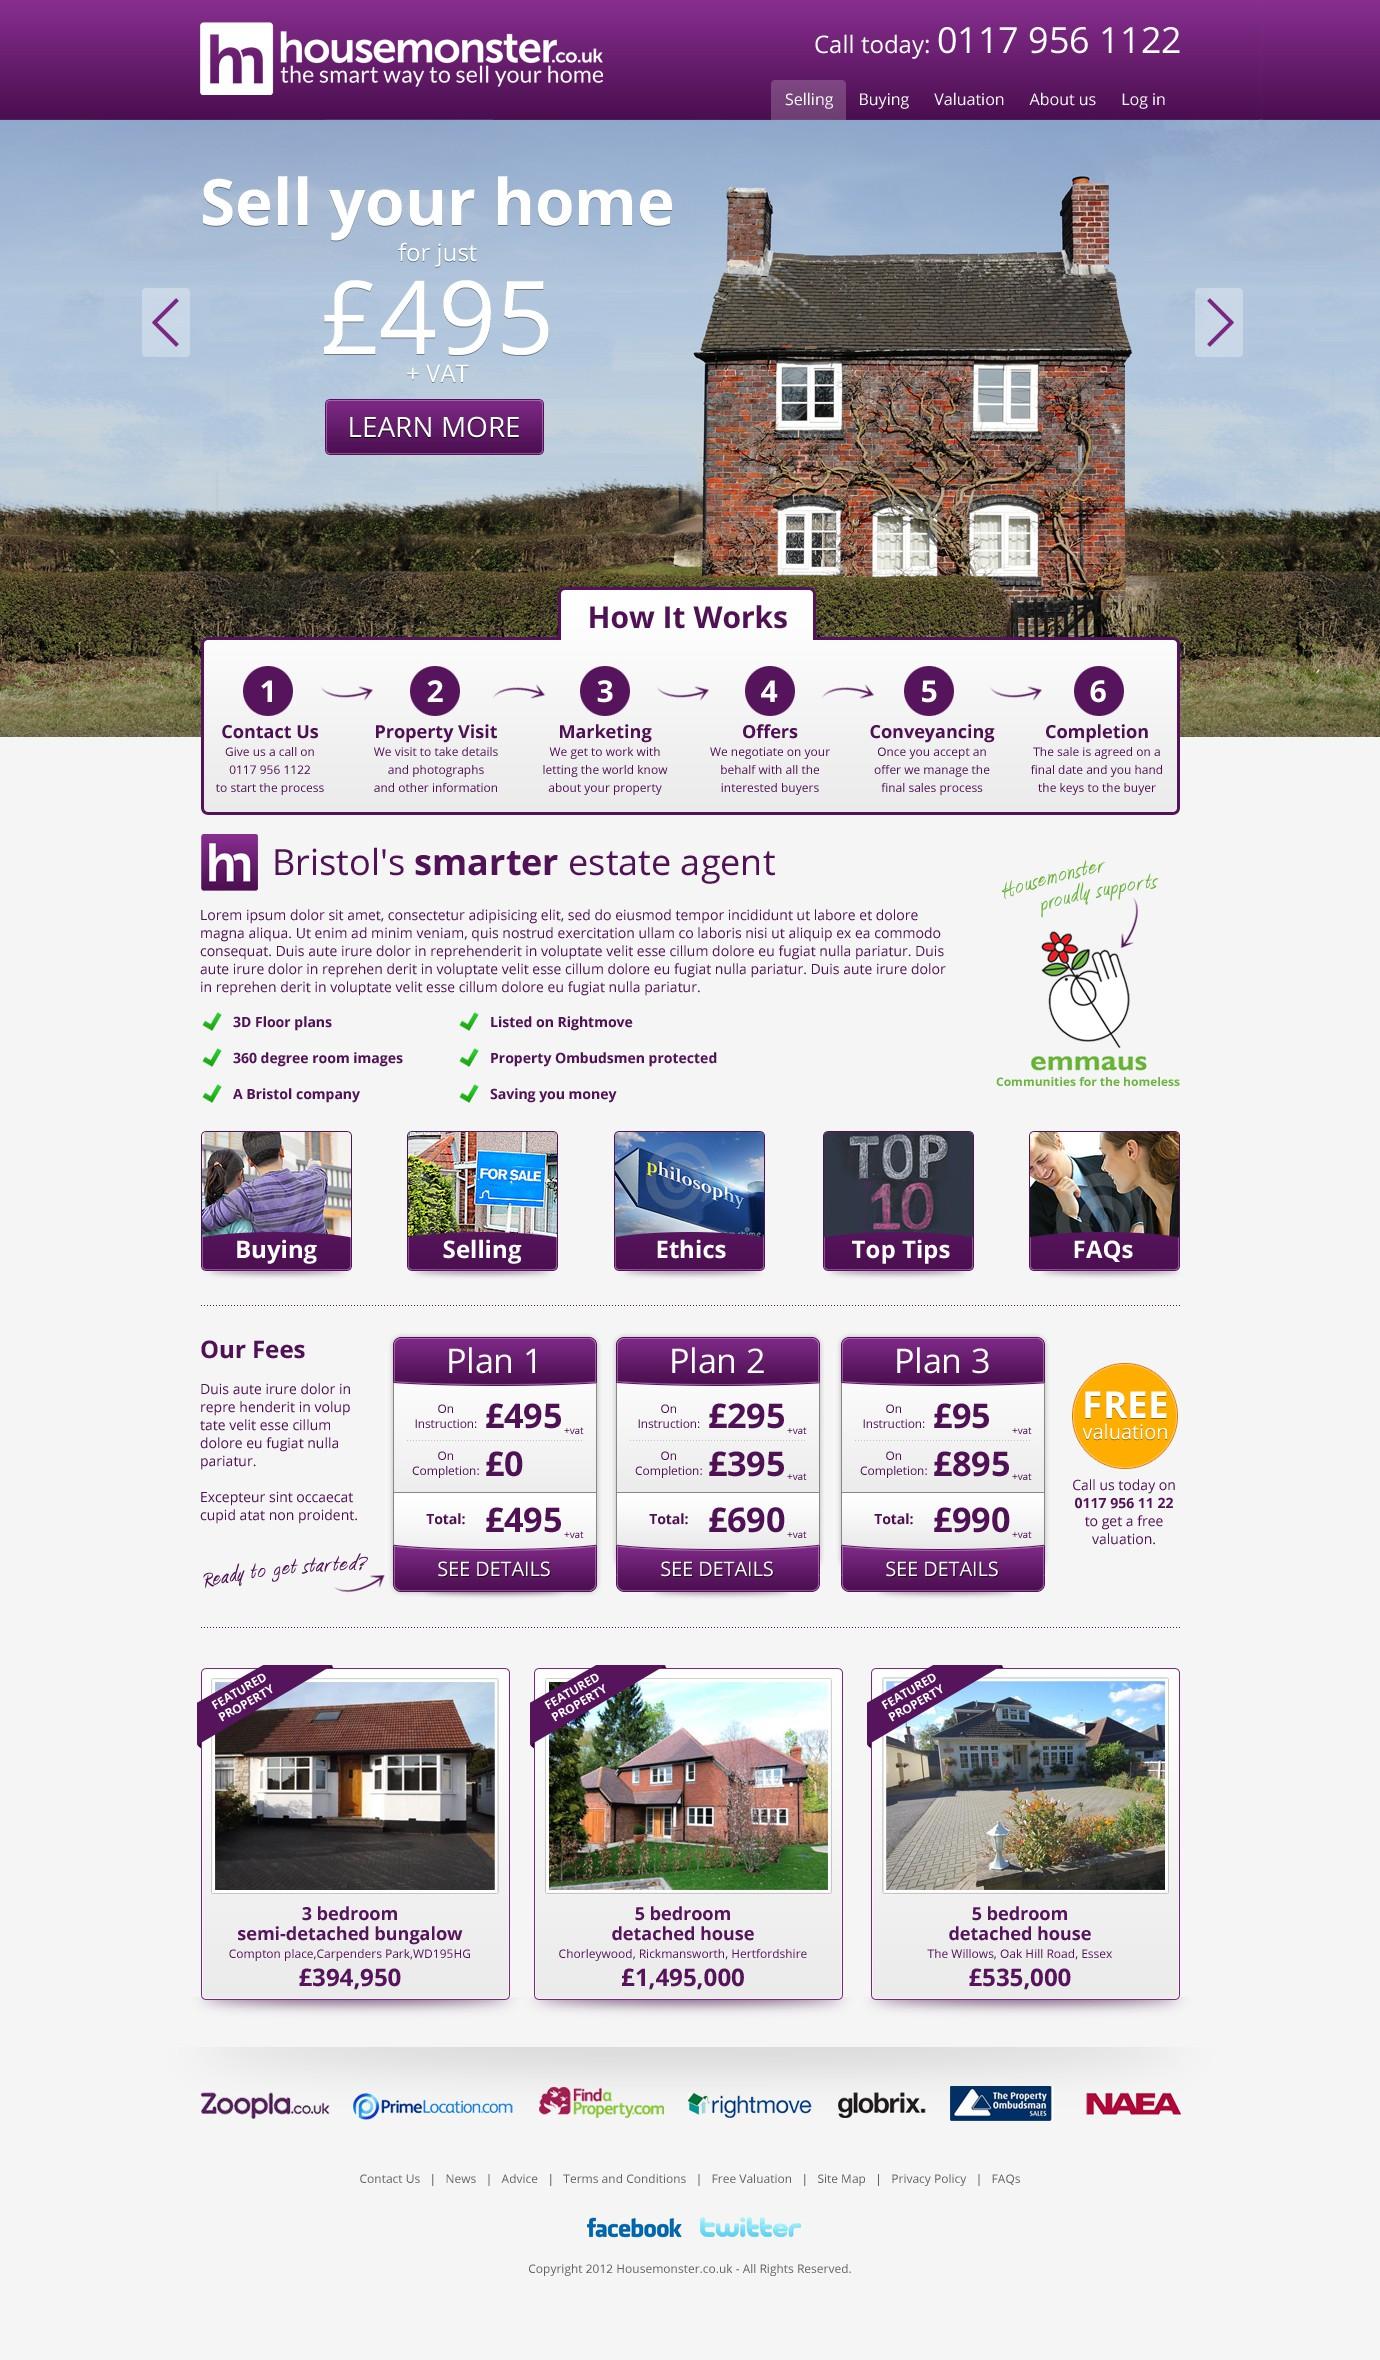 HOUSEMONSTER.co.uk needs YOU to design its brand new website!